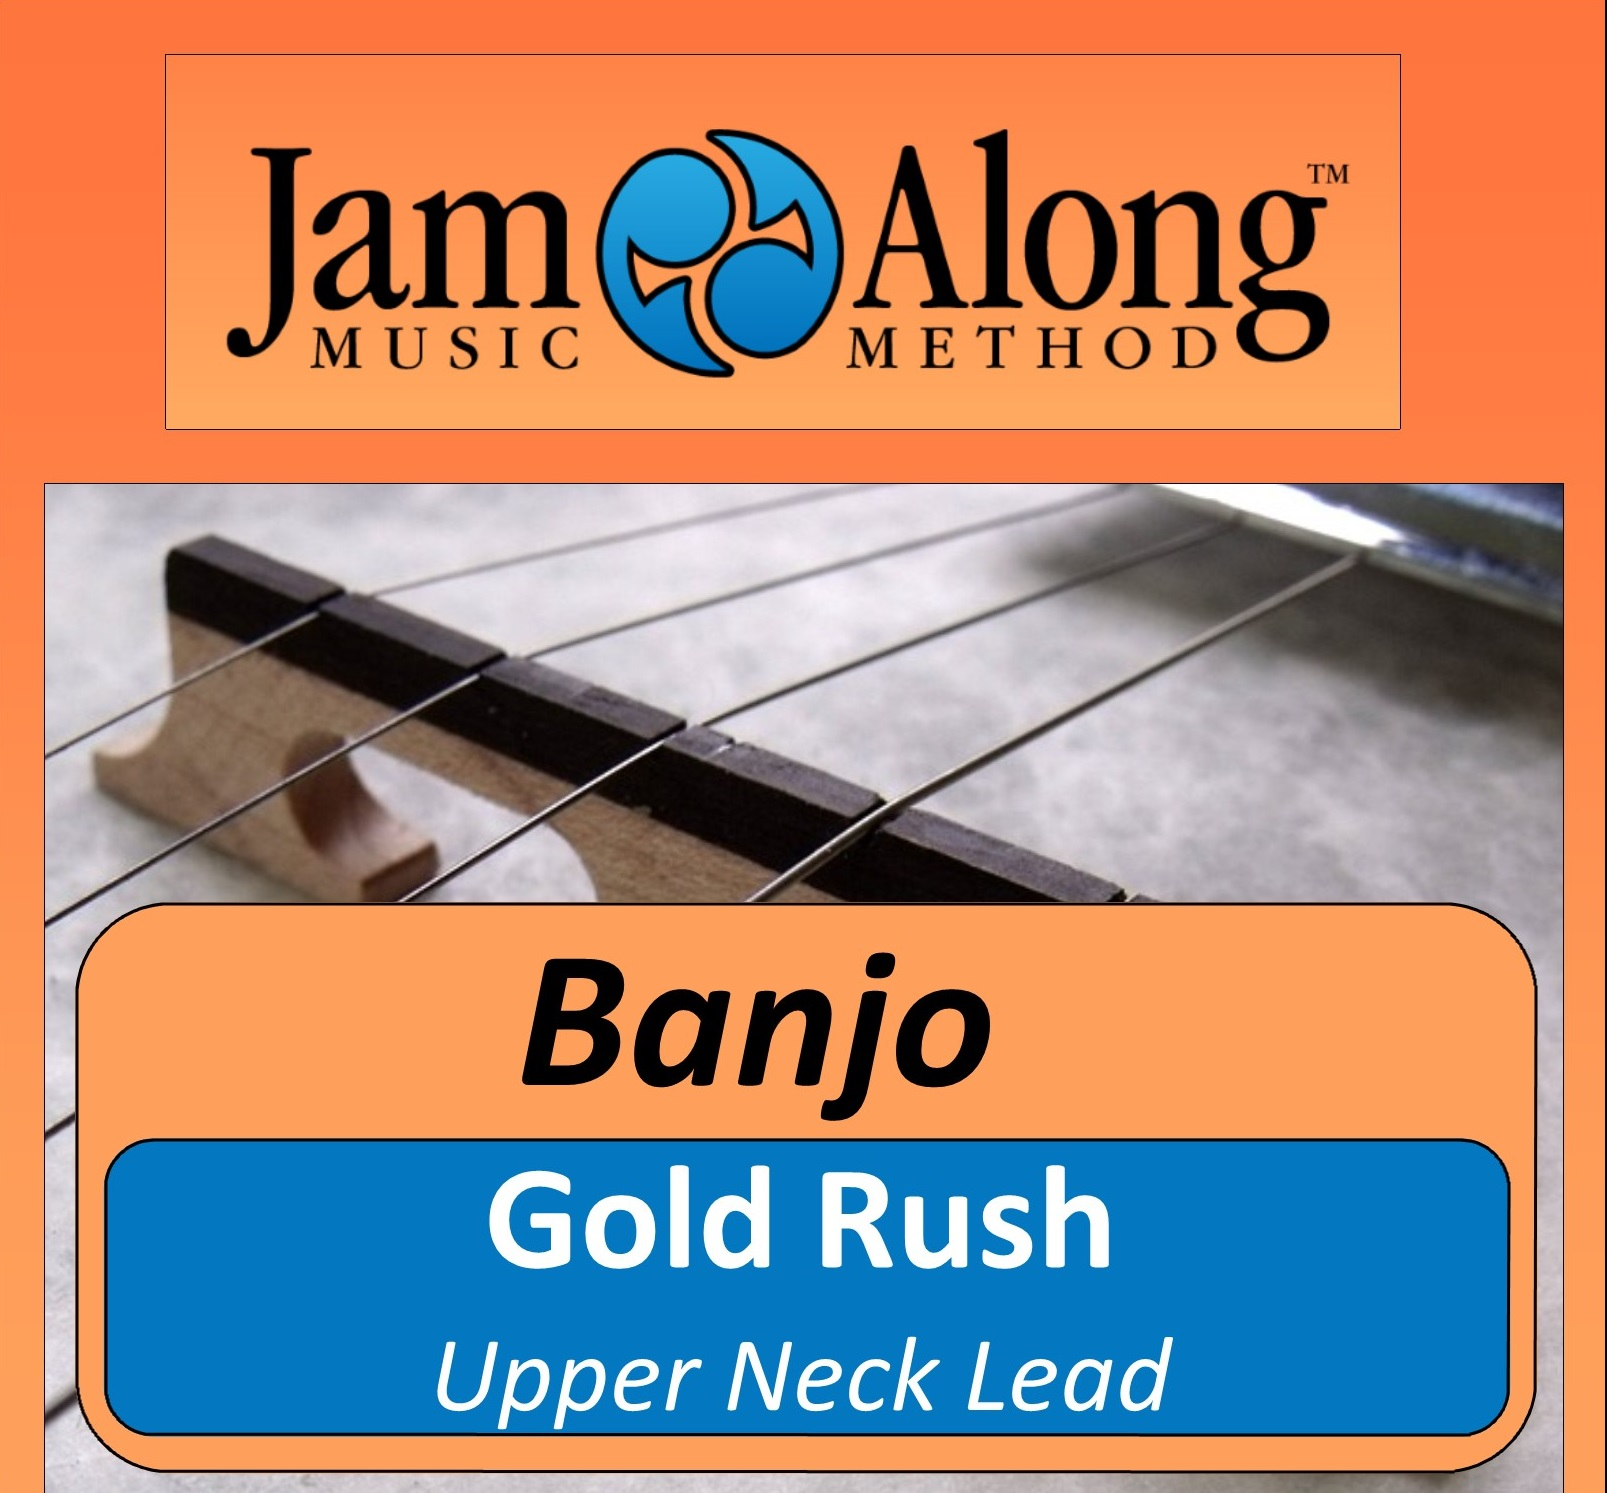 Gold Rush - Upper Neck Lead